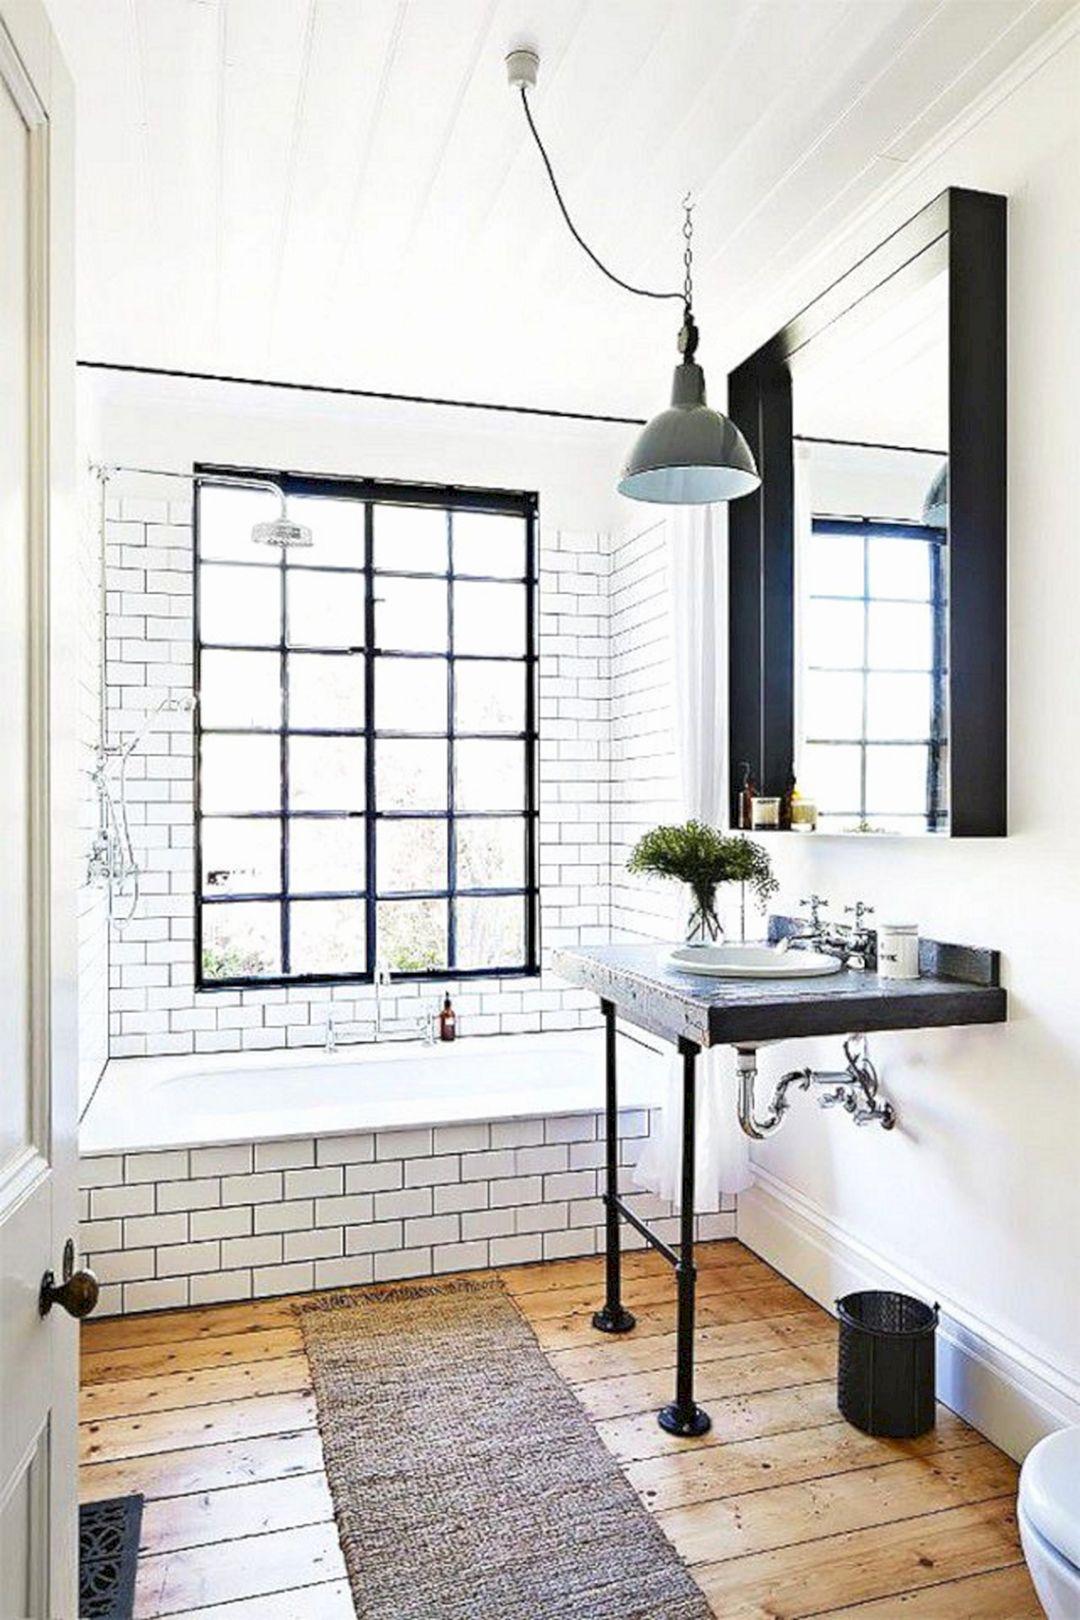 Tiny Bathroom With Industrial